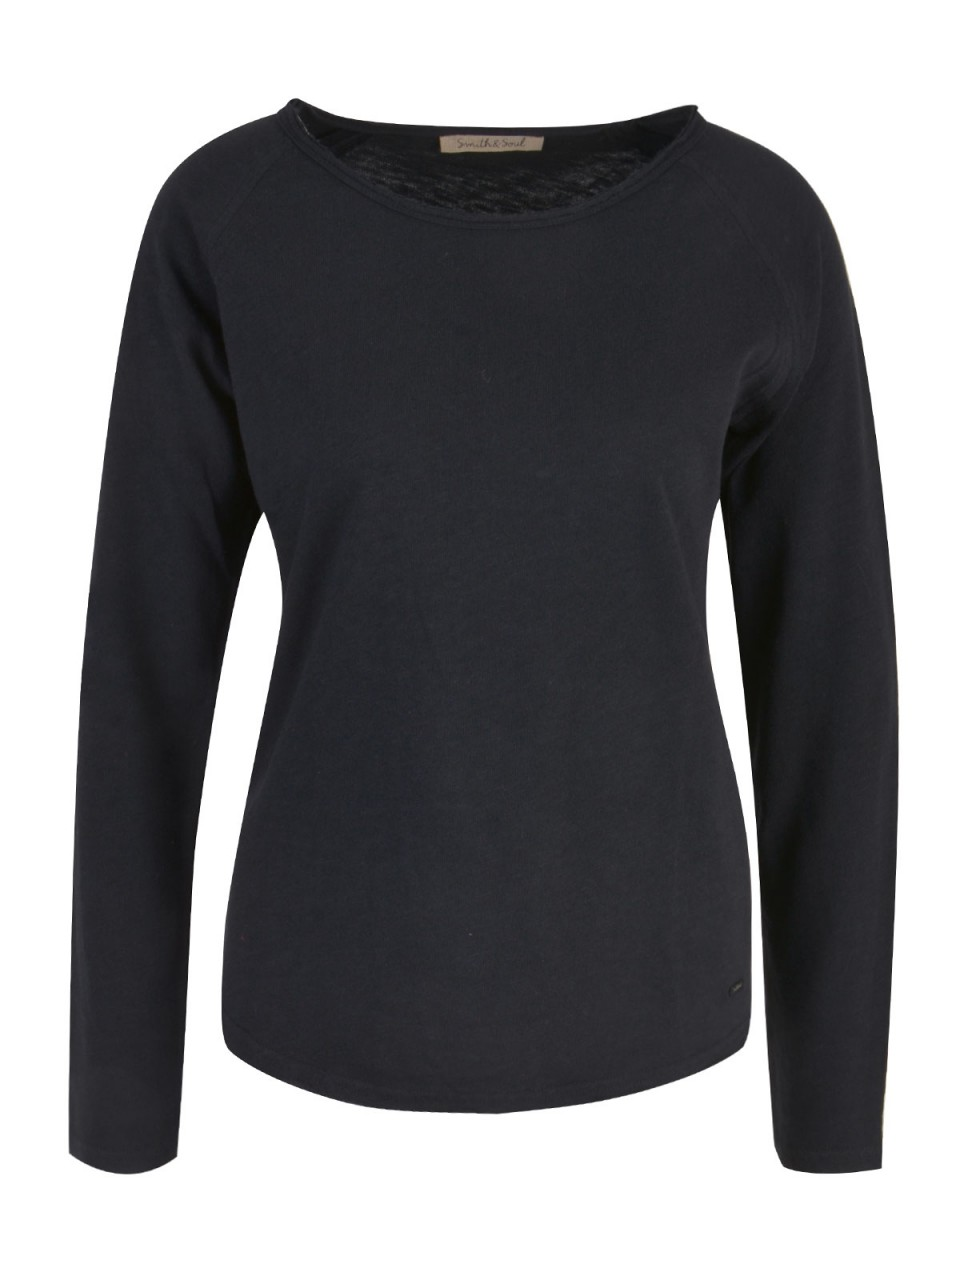 Oberteile - SMITH SOUL Damen Shirt, schwarz  - Onlineshop Designermode.com